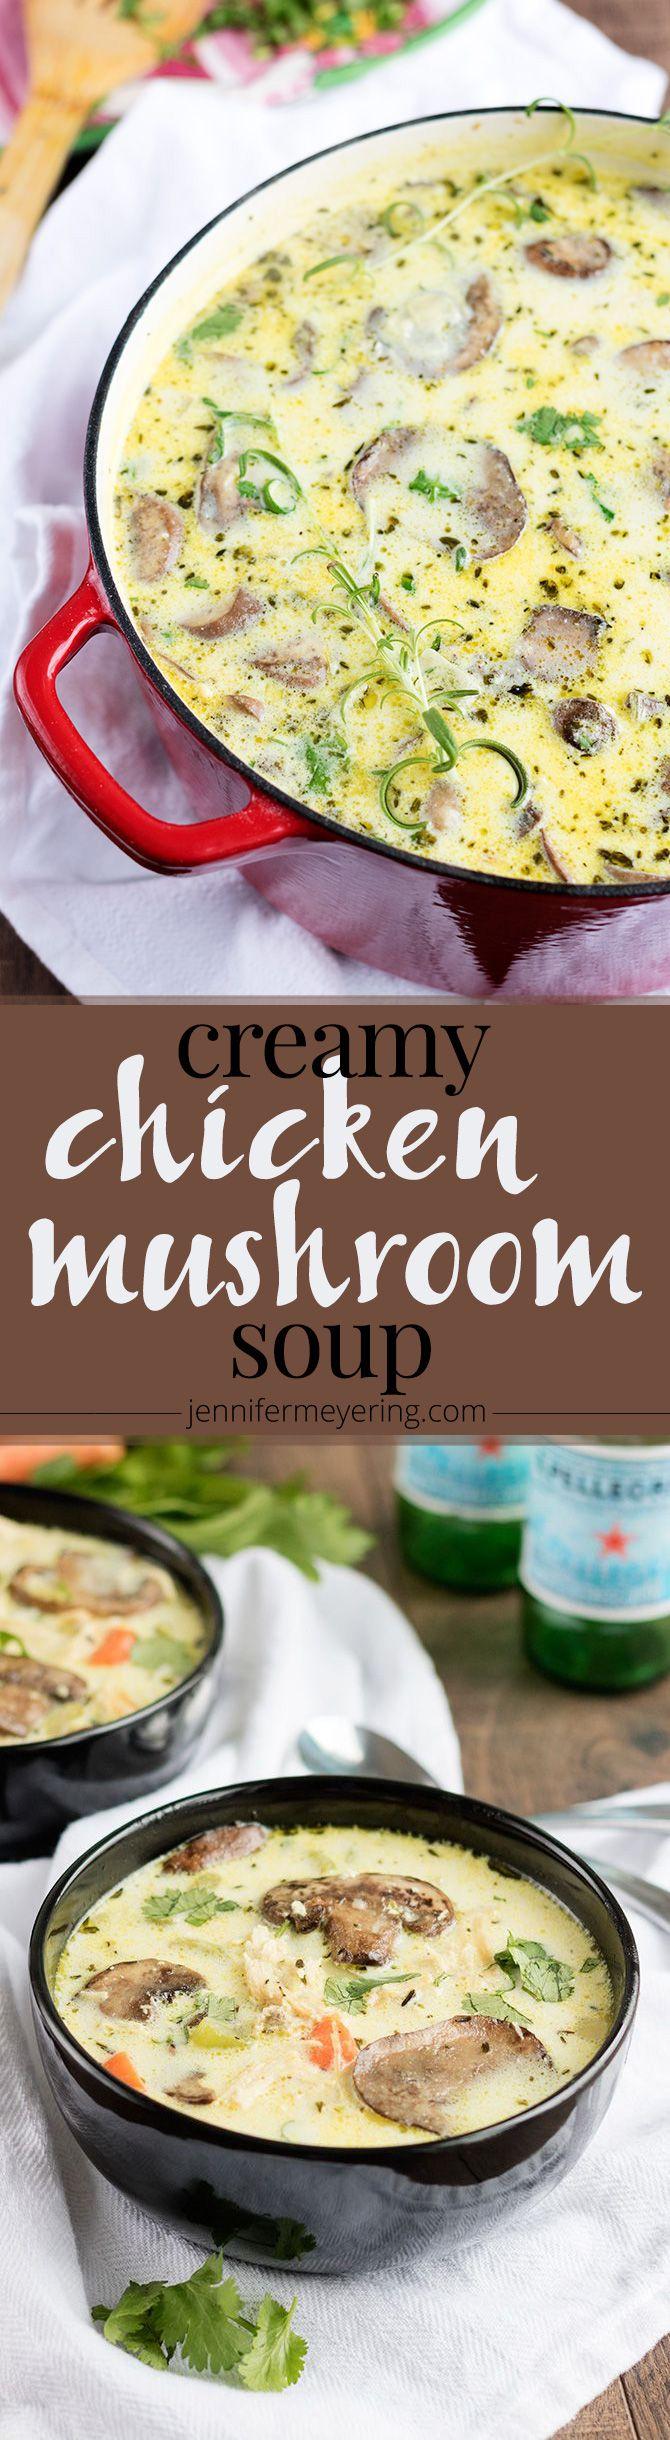 Creamy Chicken Mushroom Soup - JenniferMeyering.com